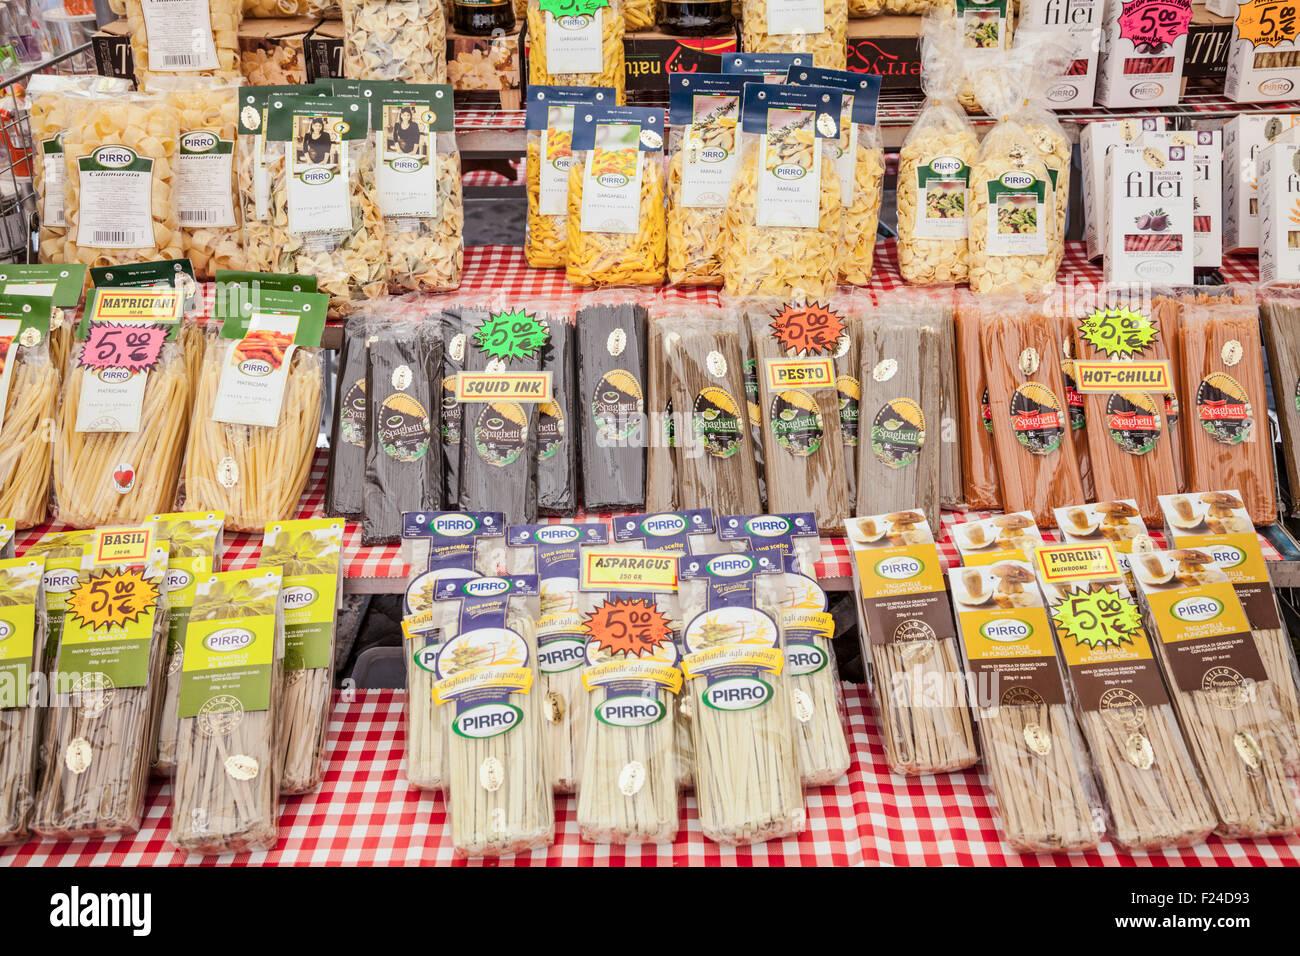 Different types of pasta for sale on a market stall in the Piazza campo de' Fiori Rome Italy roma lazio Italy - Stock Image